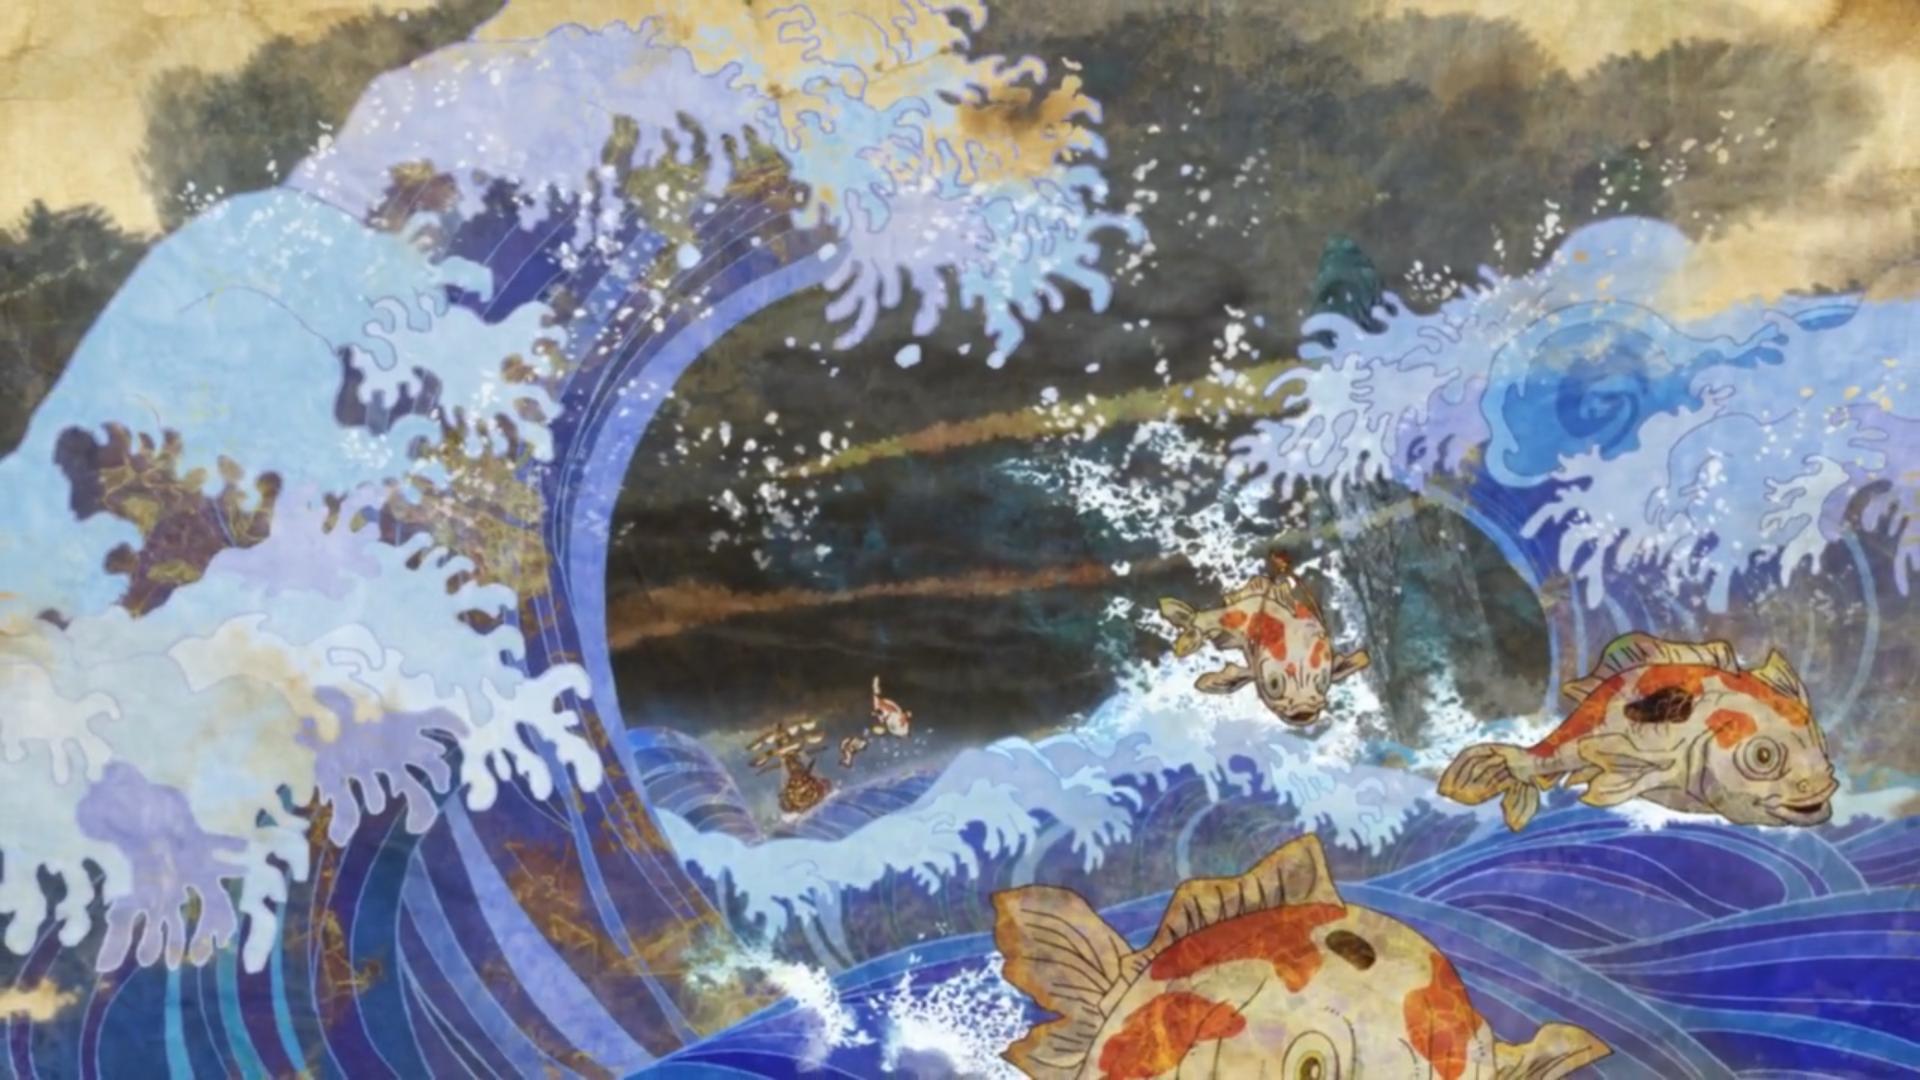 One Piece Wano Wallpaper 1920x1080 - Bakaninime